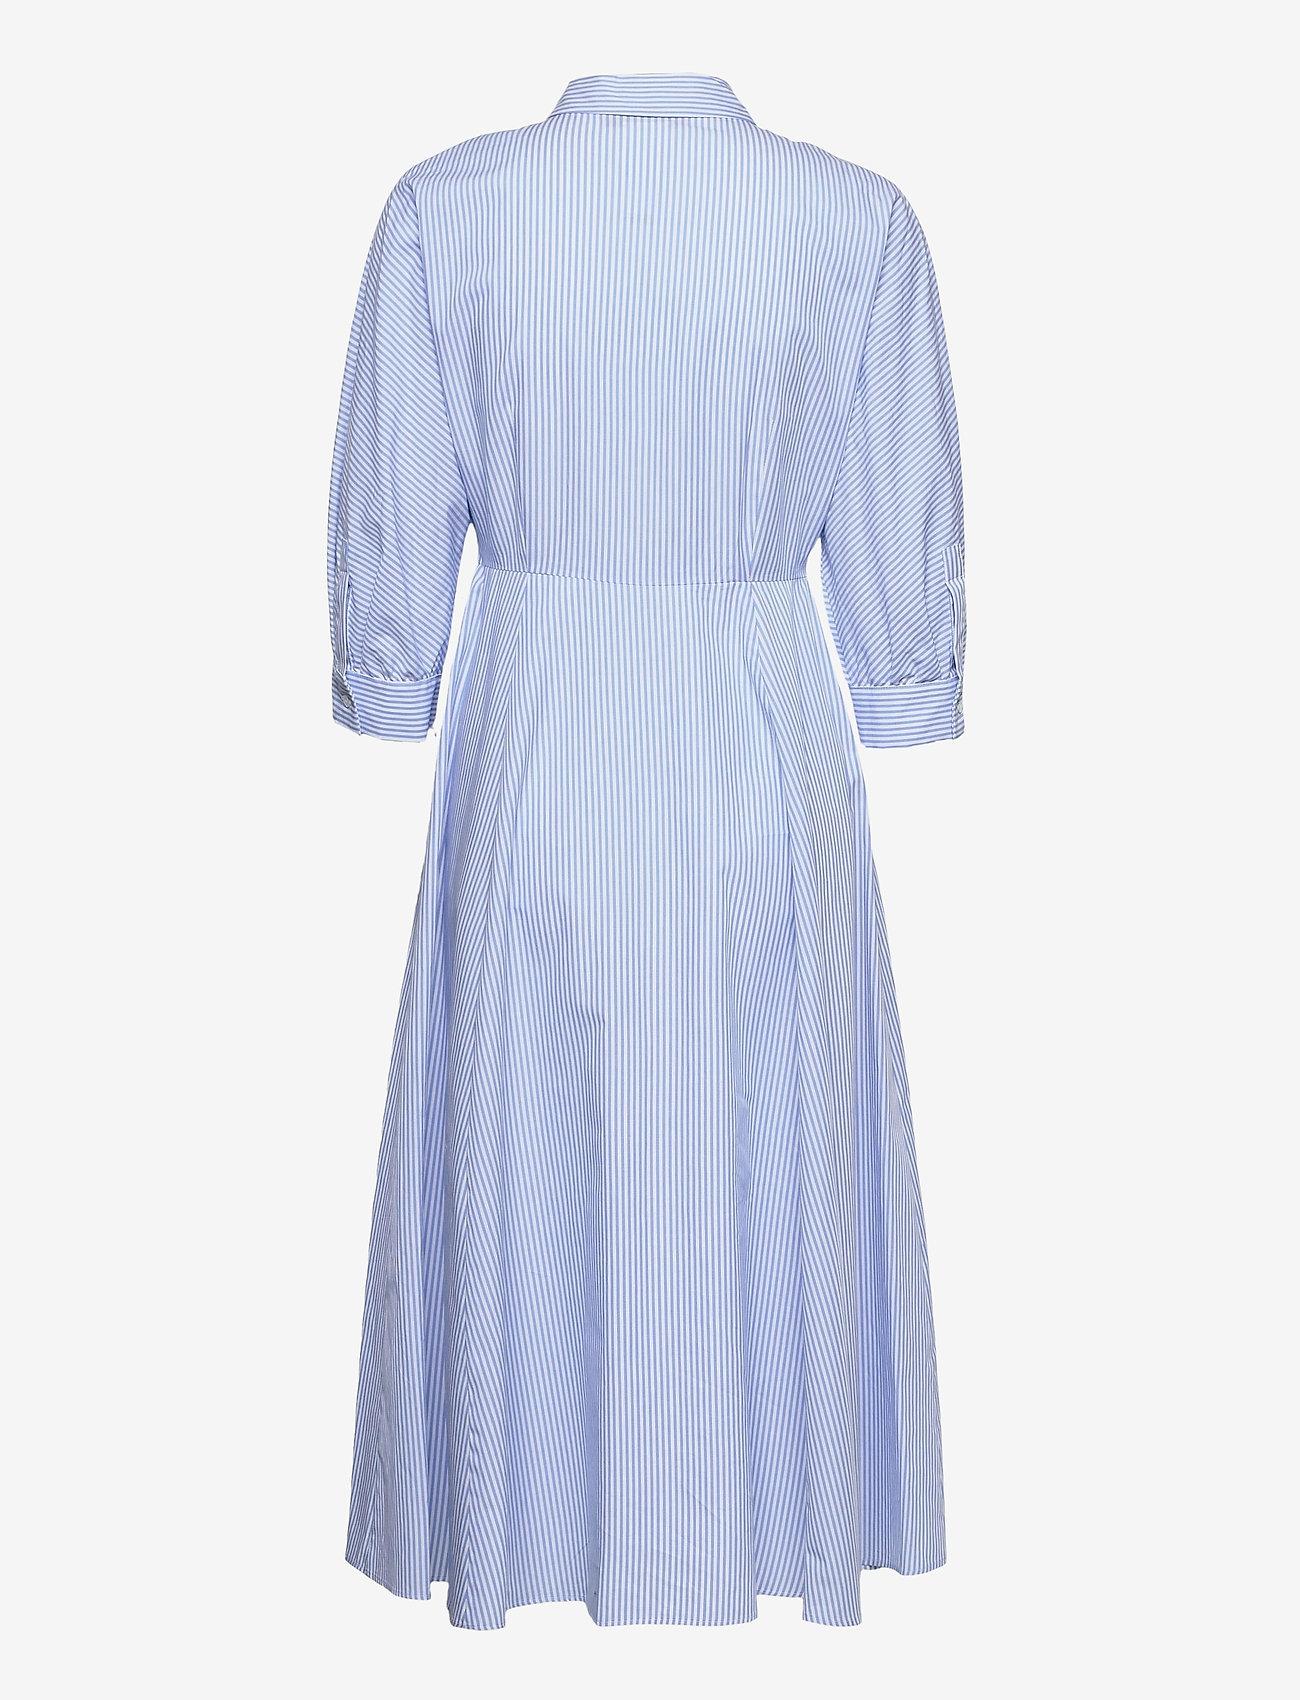 Max&Co. - CARLO - zomerjurken - light blue pattern - 1